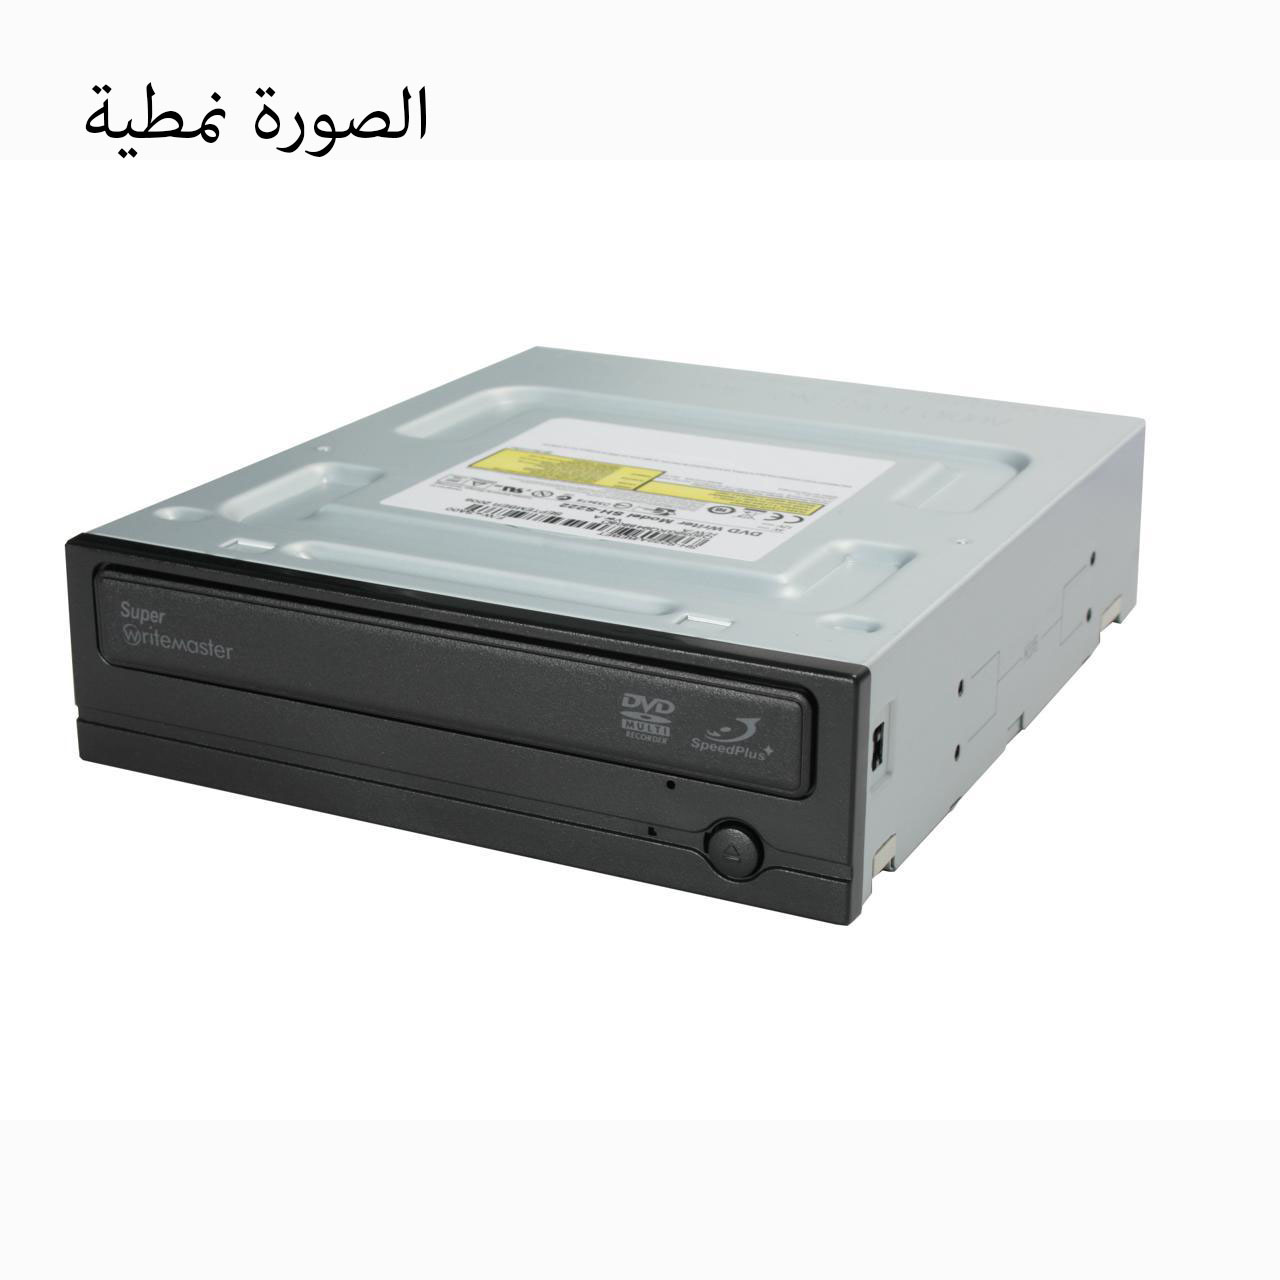 CDD WRITER DVD SAMSUNG 22X8X32X48 BLACK IDE TRAY مستعمل ,Other Used Items